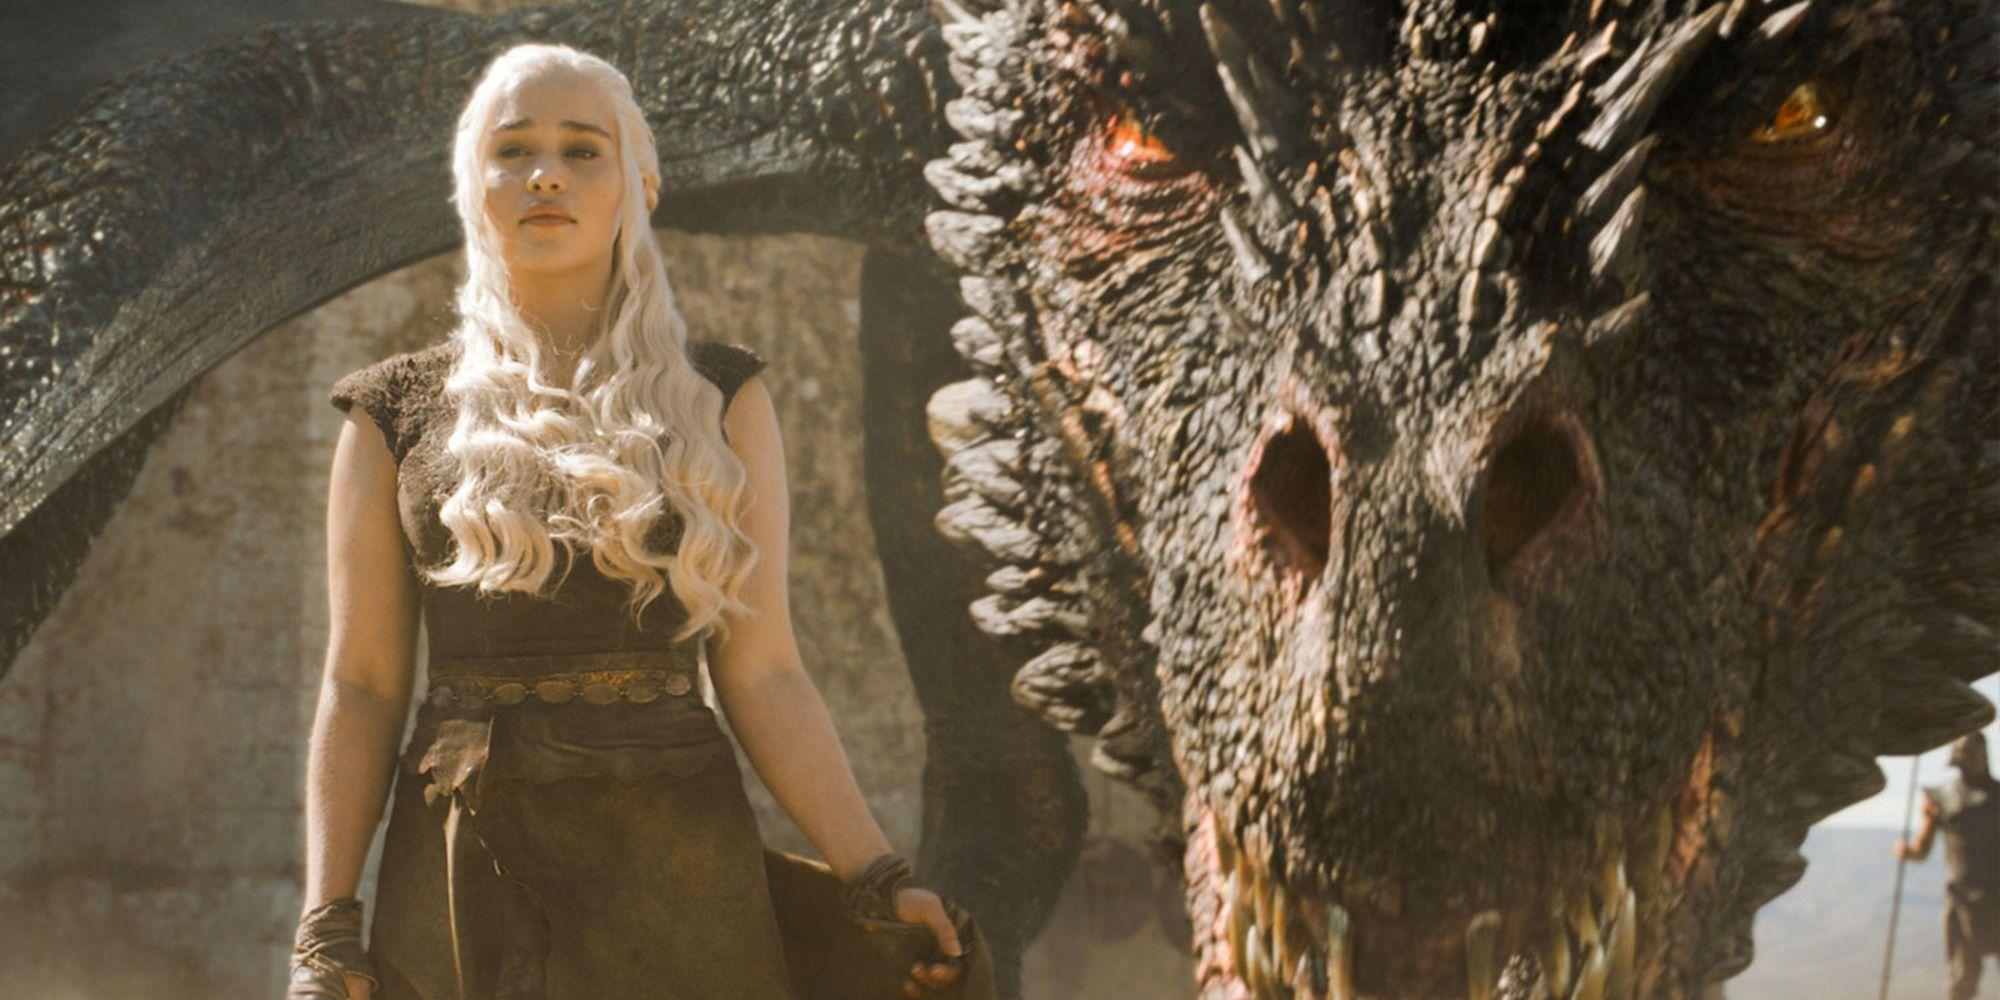 Why Emilia Clarke Turned Down Fifty Shades of Grey | CBR